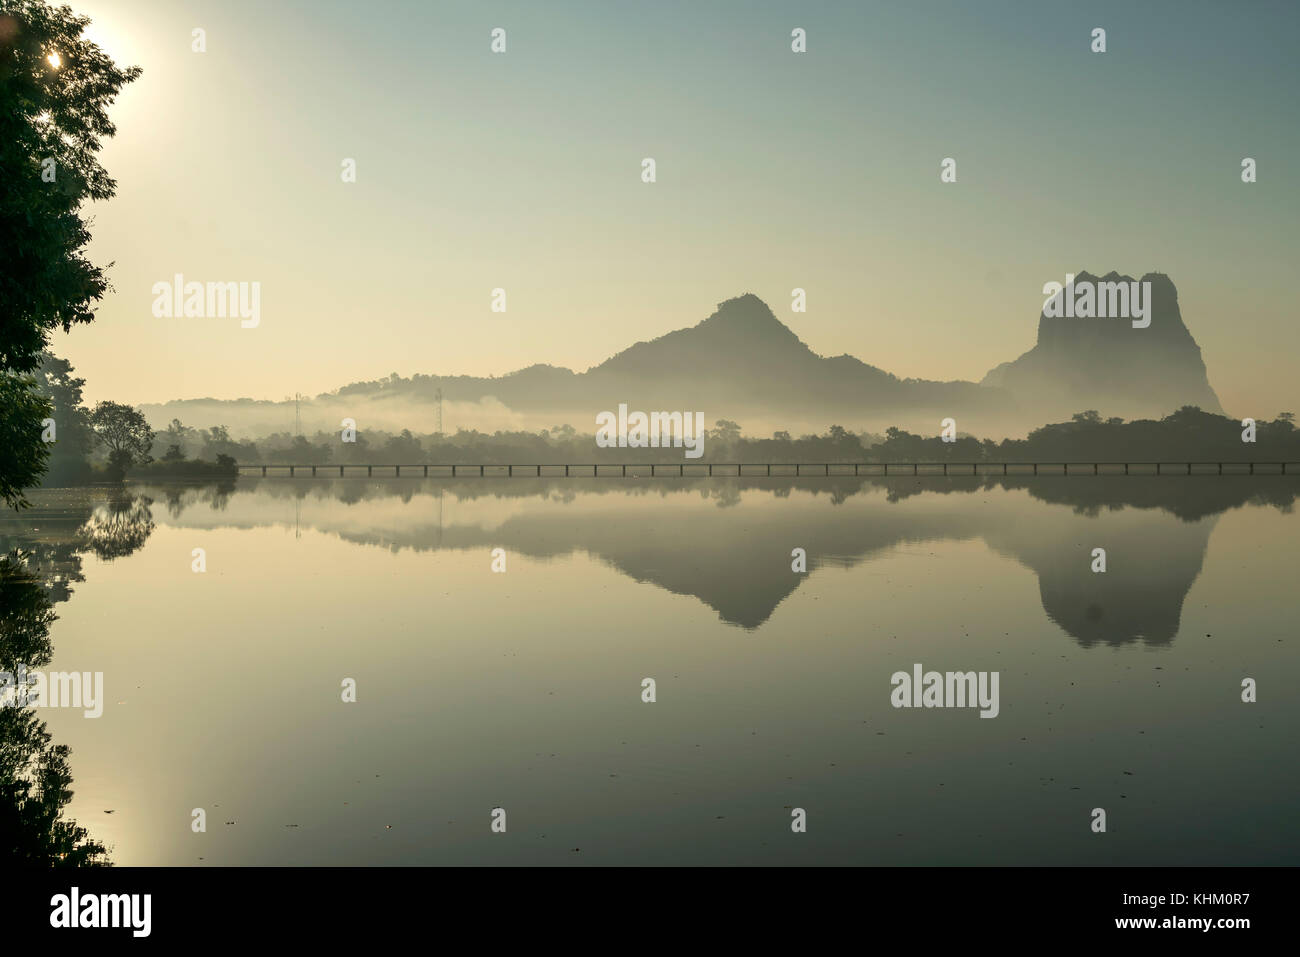 Atmosfera di mattina a kan thar yar vedere, di Hpa-an, myanmar, asia Immagini Stock